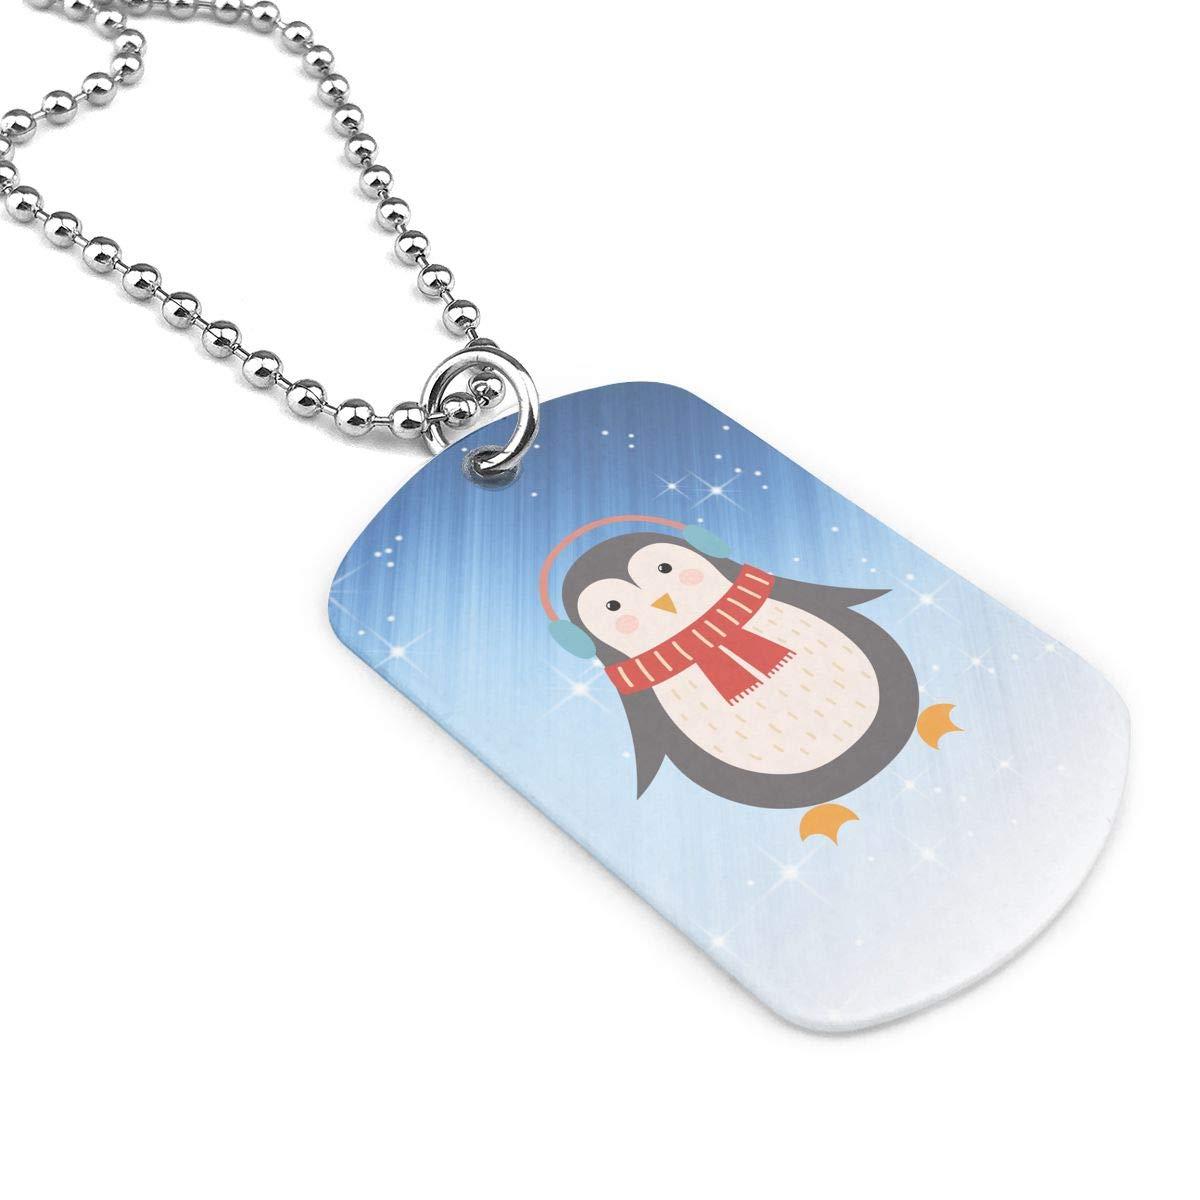 Military Necklace Penguin Custom Zinc Alloy Pendant Necklace Dog Tags